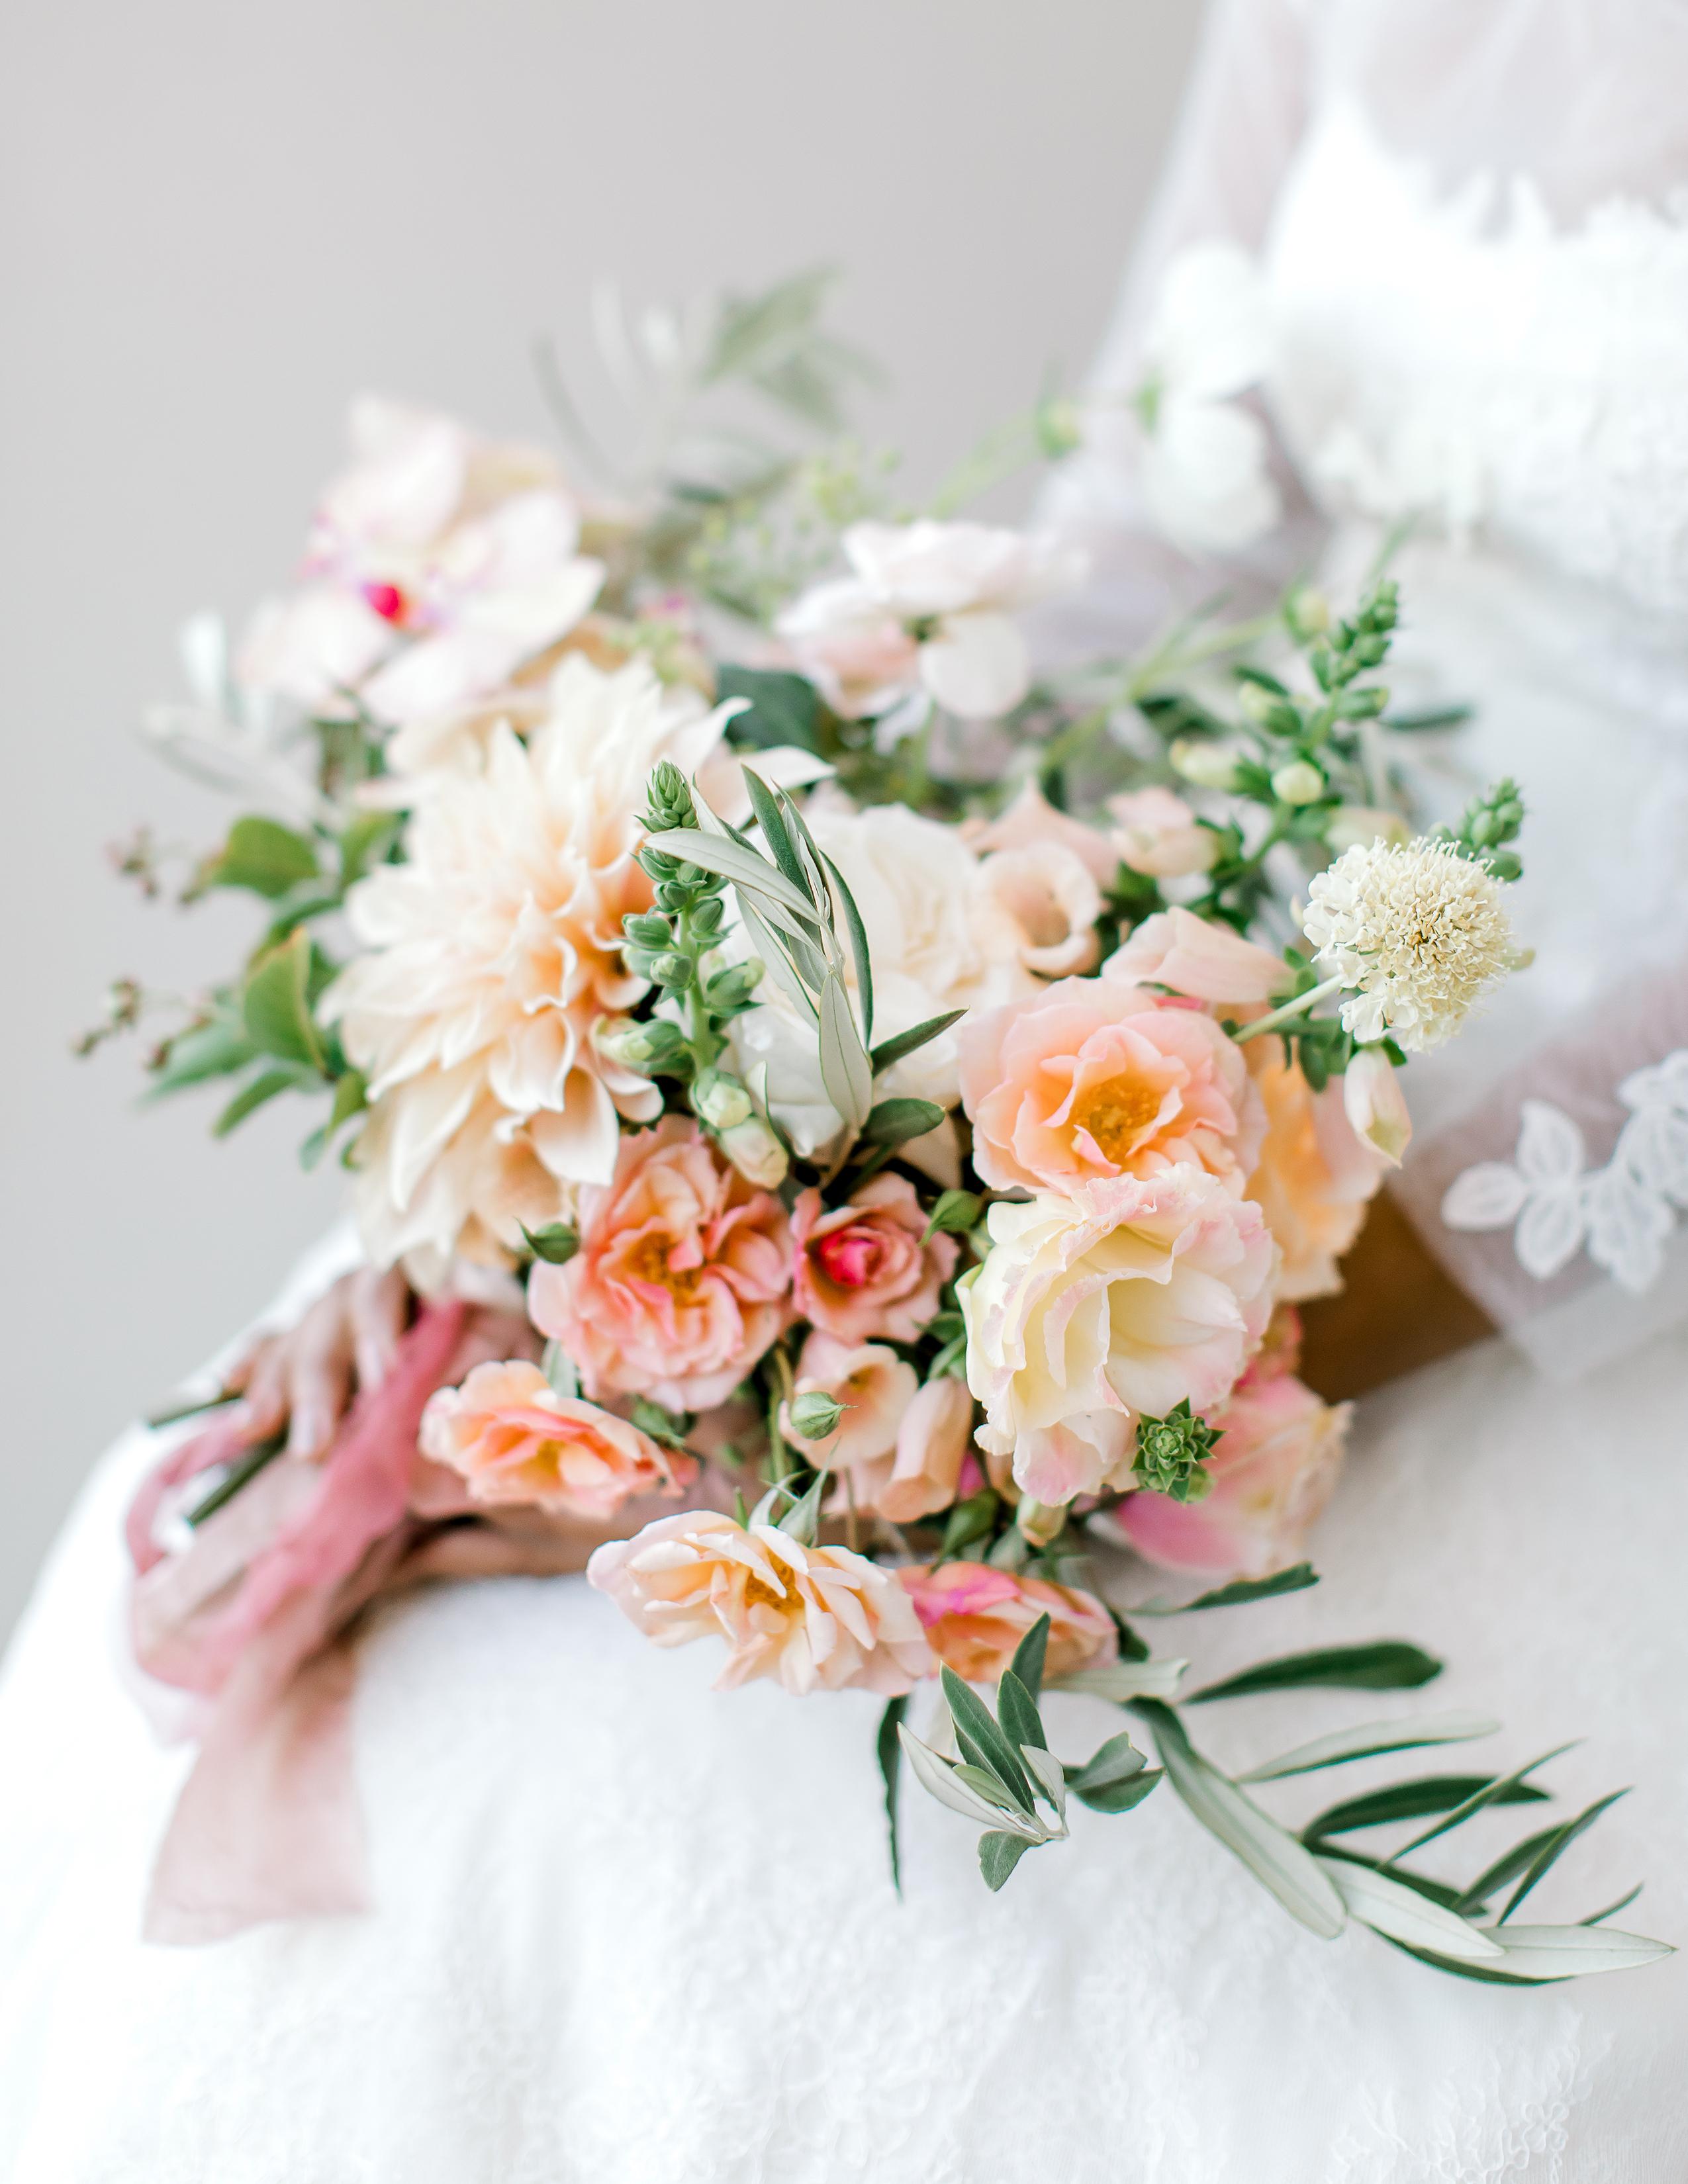 rorisang stephen wedding bride's bouquet